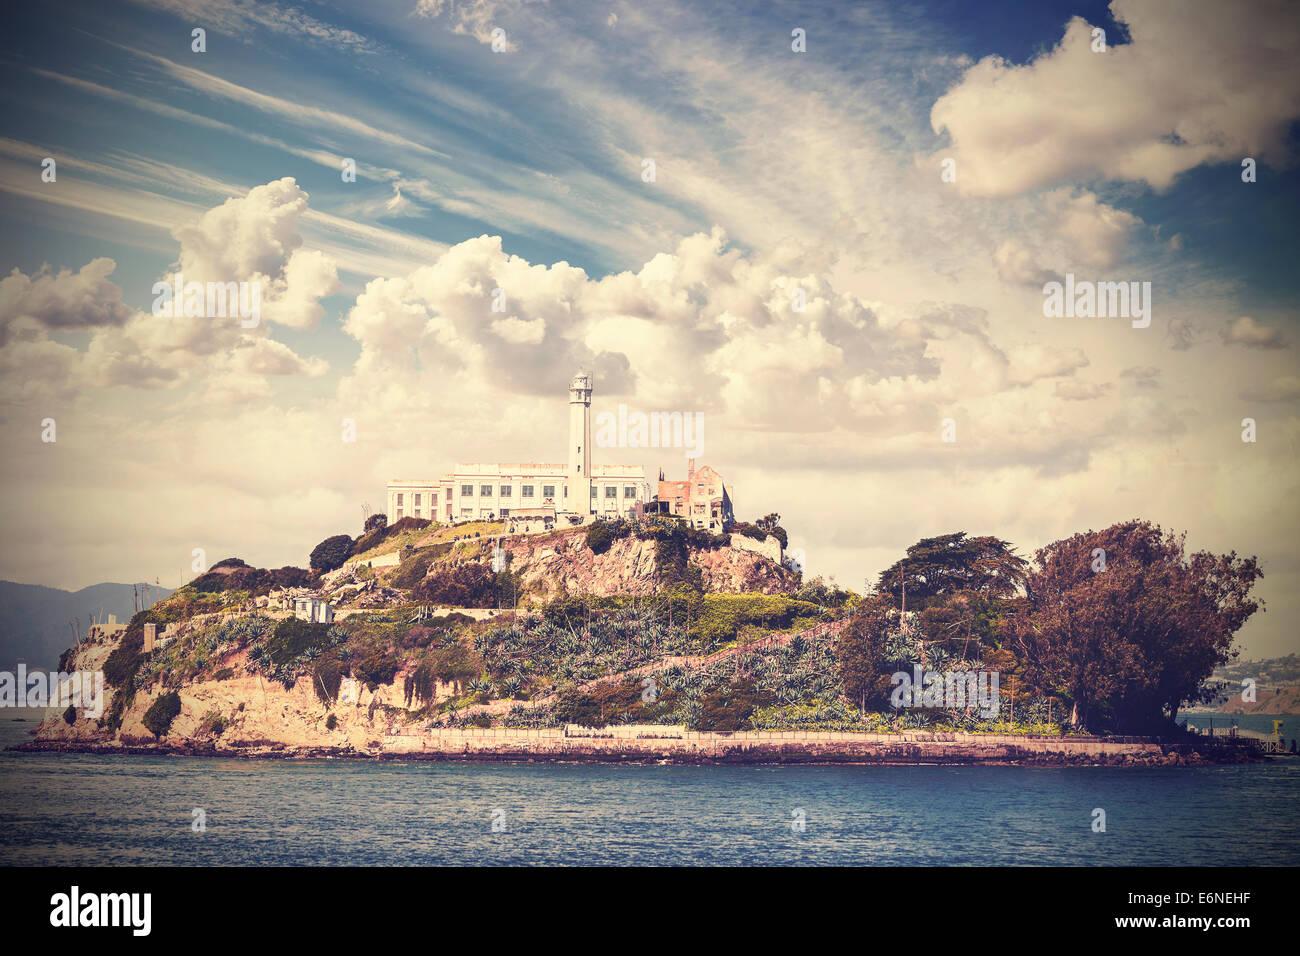 Vintage picture of Alcatraz Island in San Francisco, USA. - Stock Image